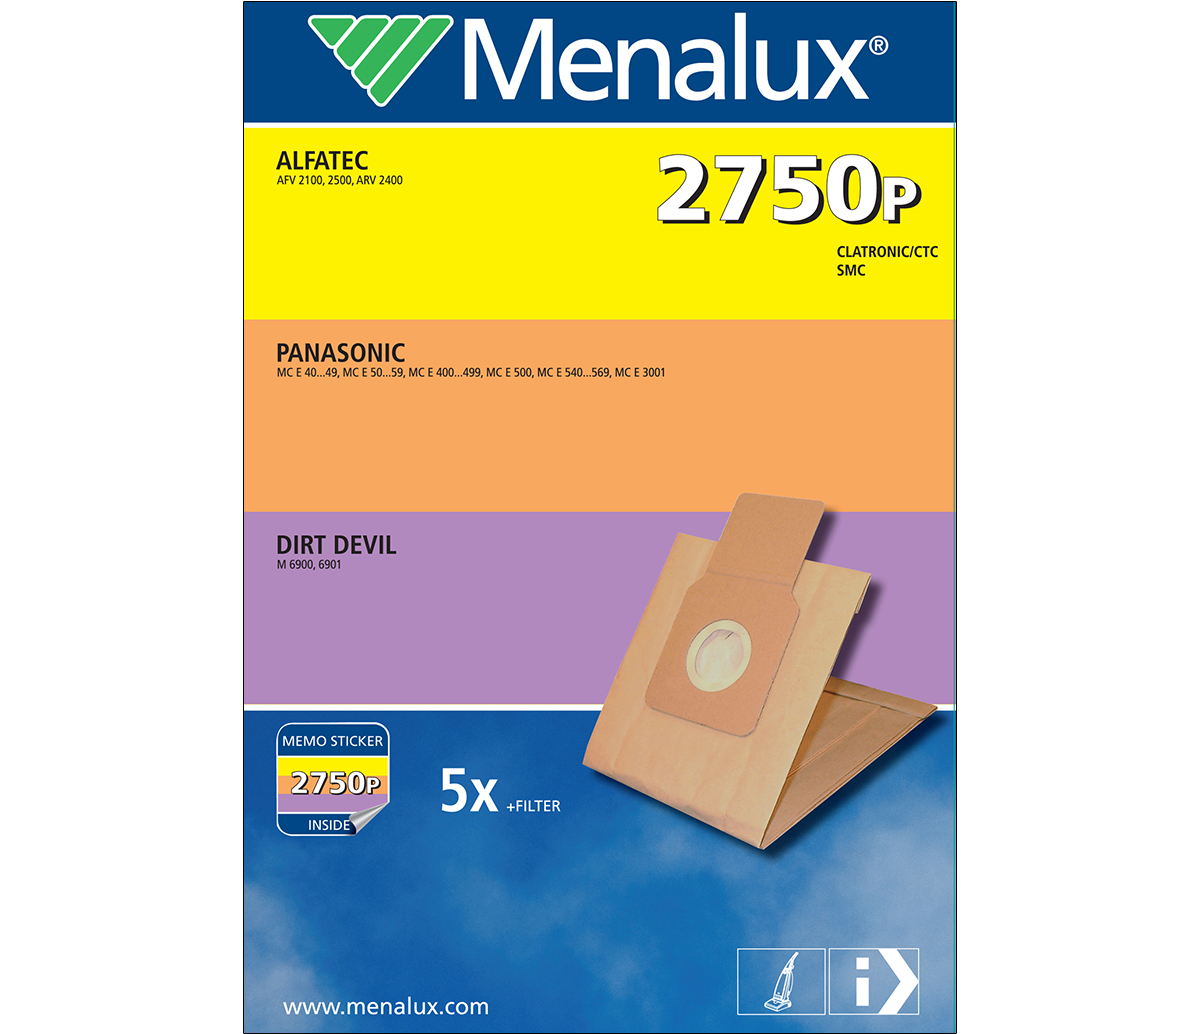 Menalux 2750 P Staubsaugerbeutel für Alfatec Clatronic Dirt Devil Panasonic